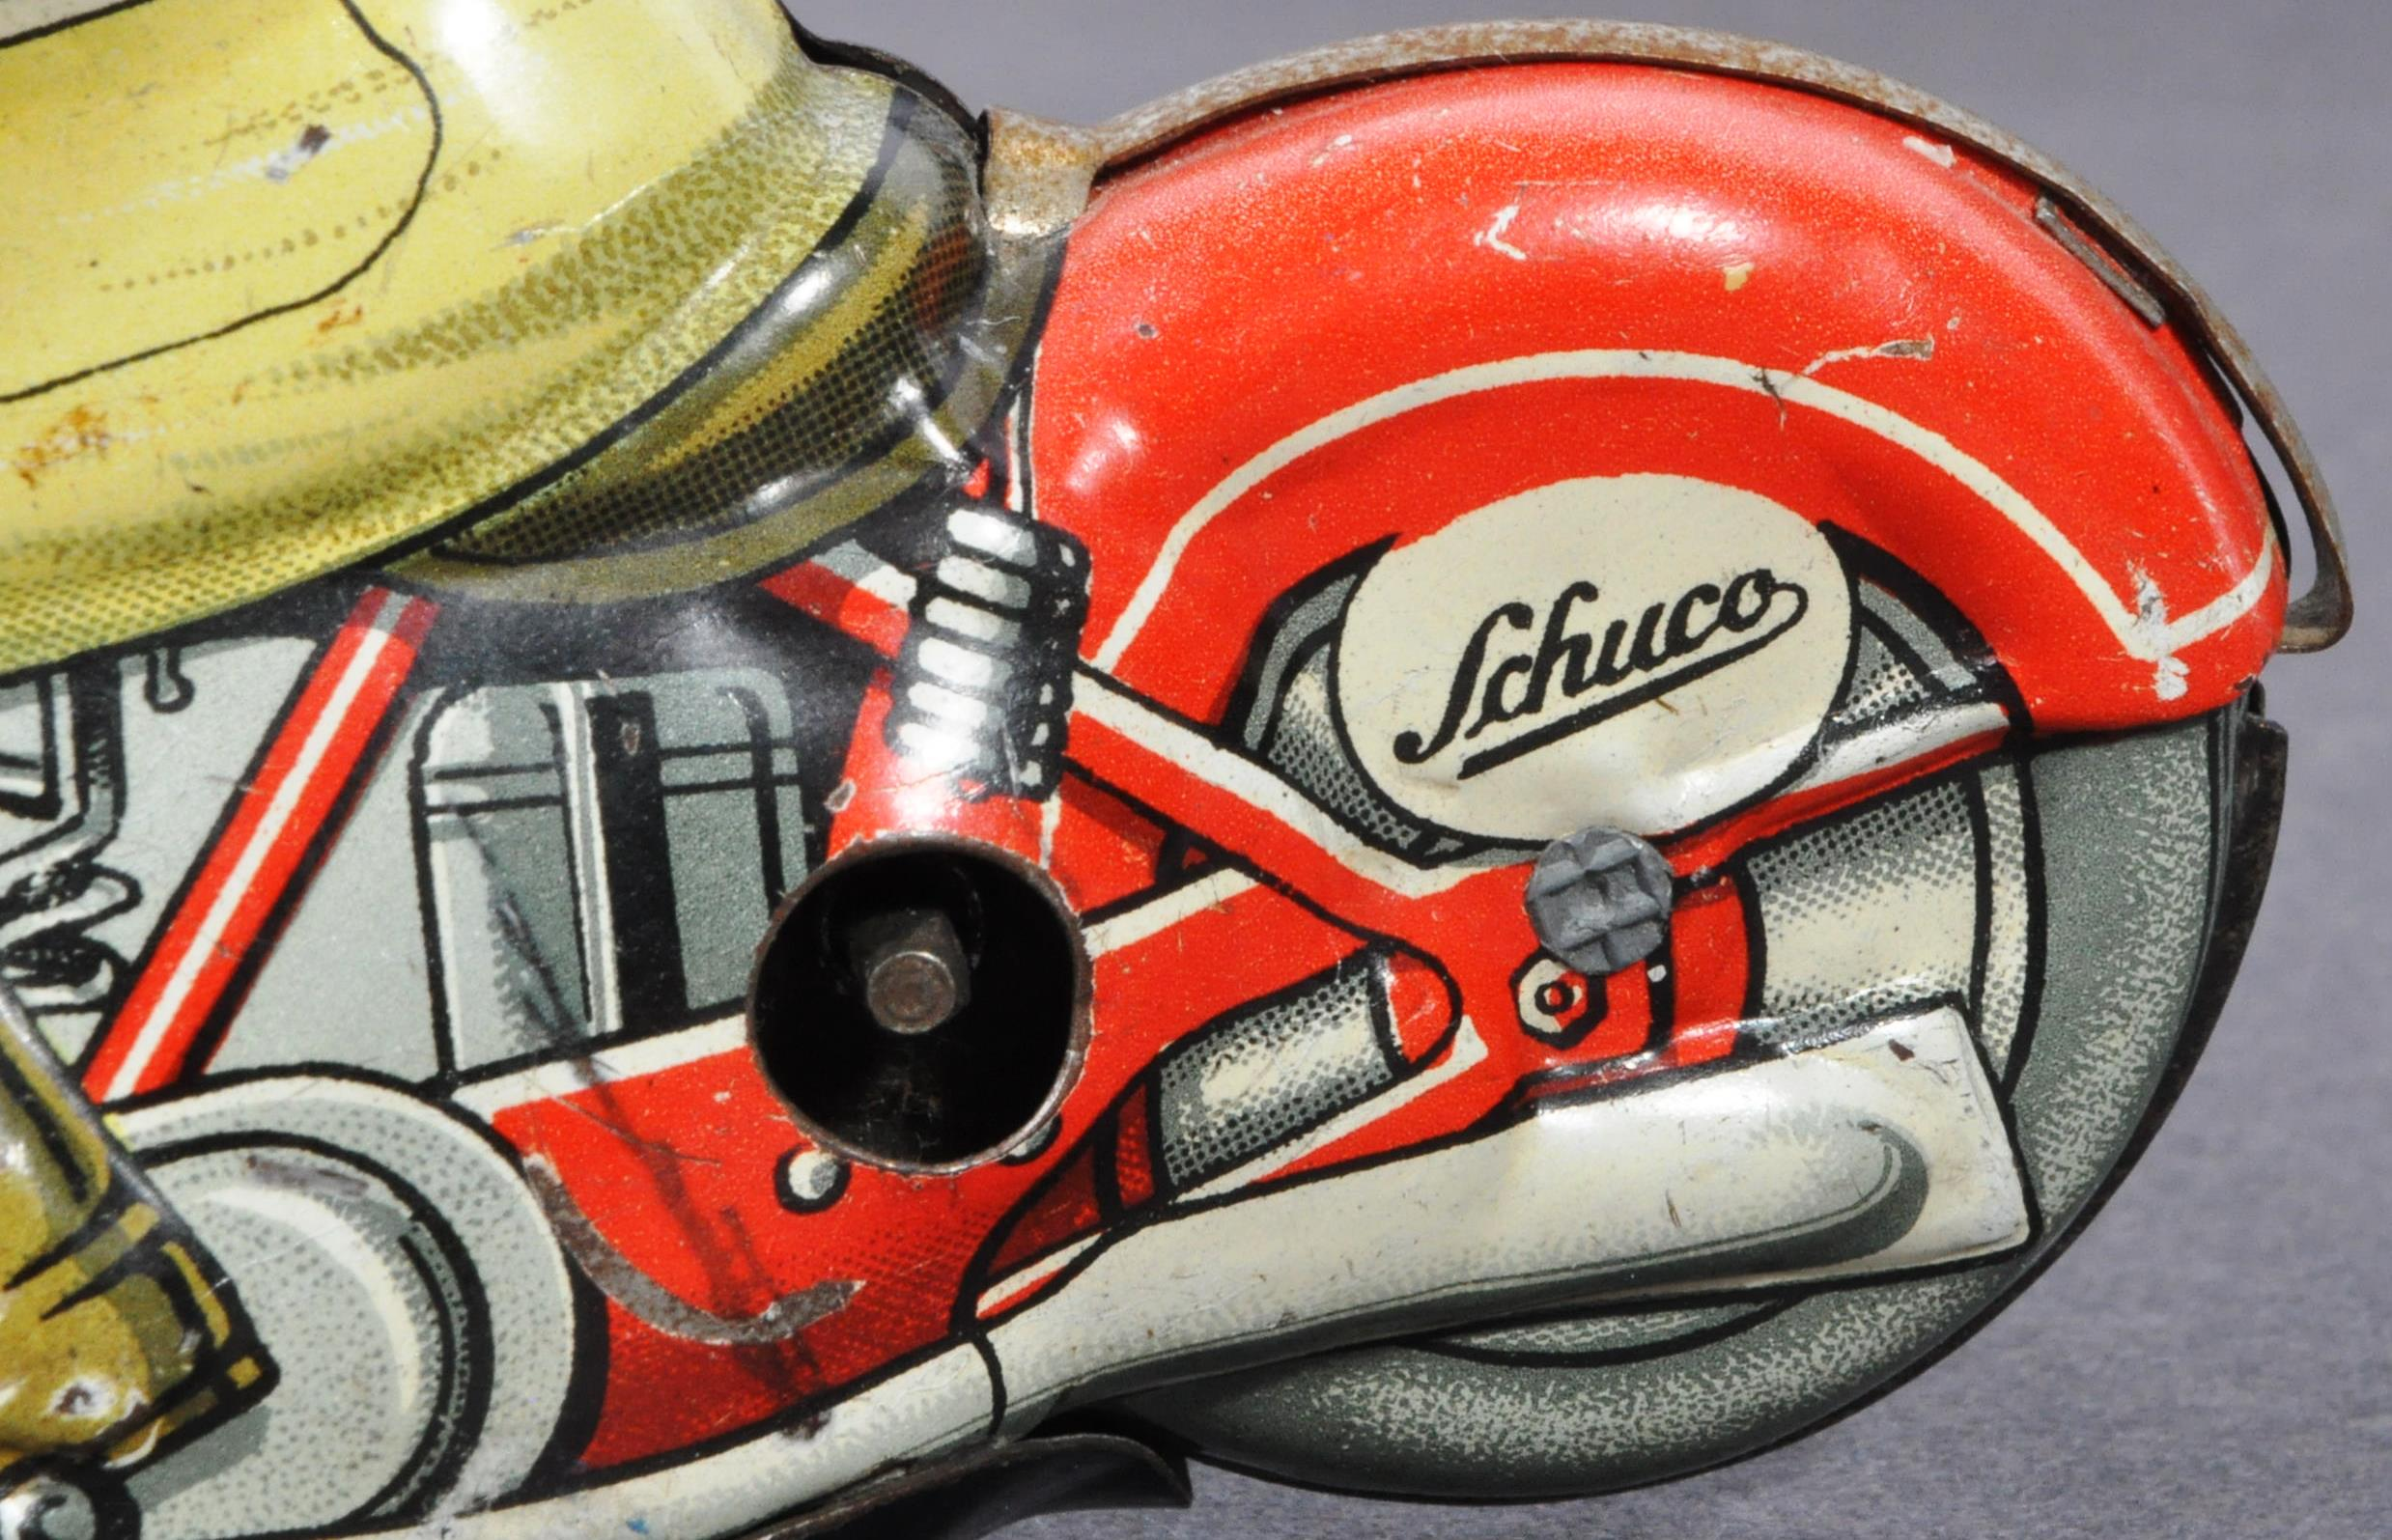 ORIGINAL VINTAGE SCHUCO TINPLATE RACING MOTORCYCLE - Image 8 of 8